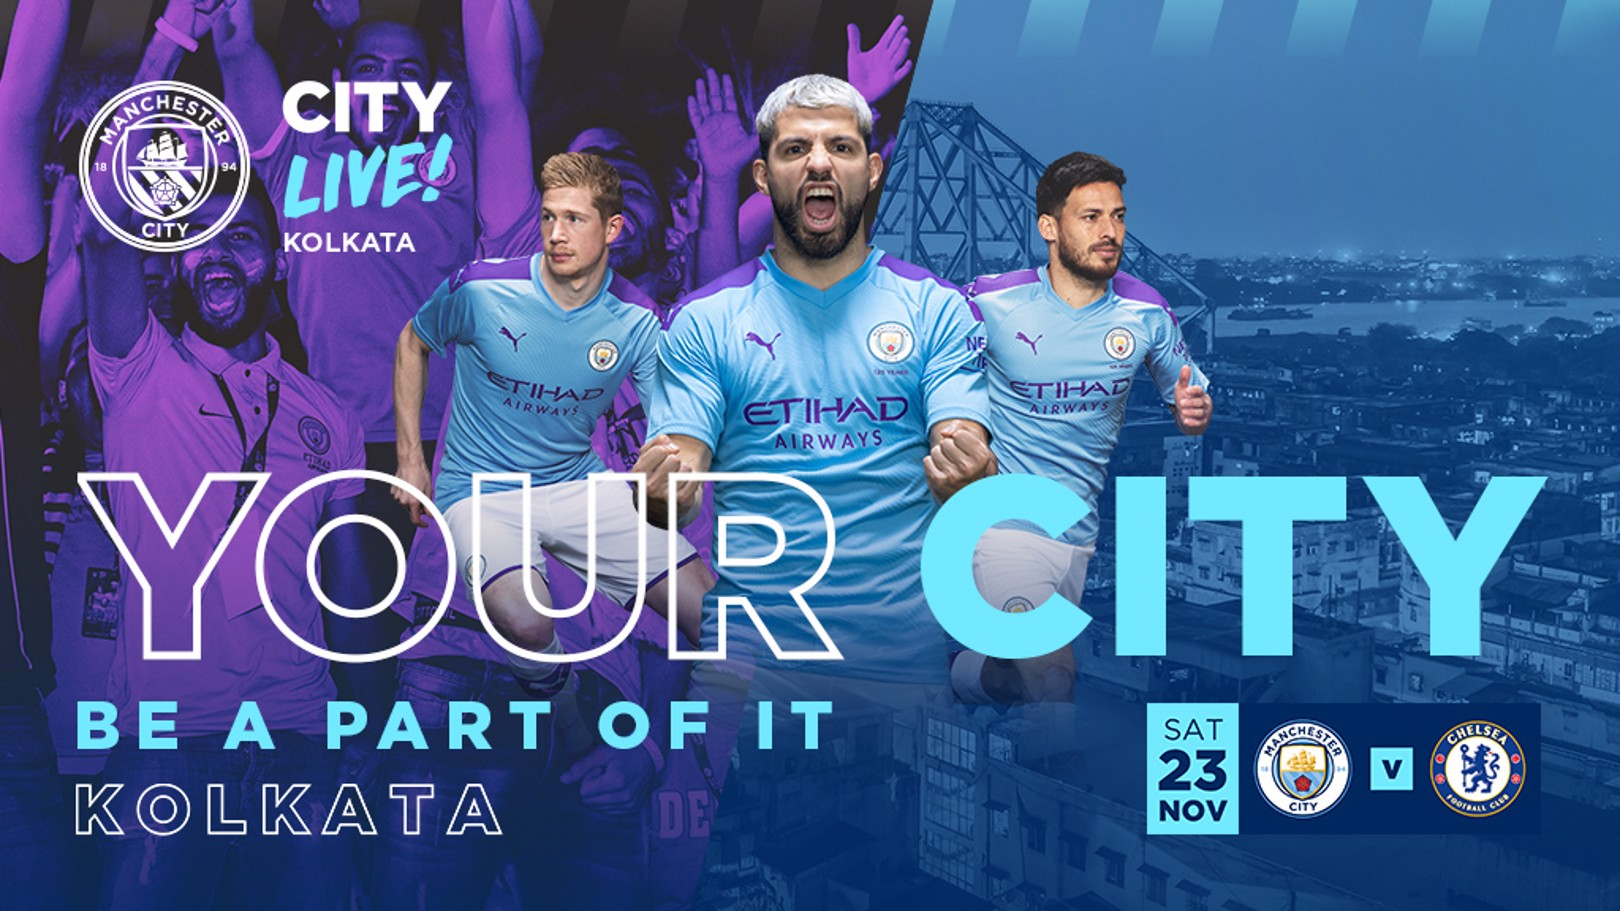 City Live! returning to Kolkata